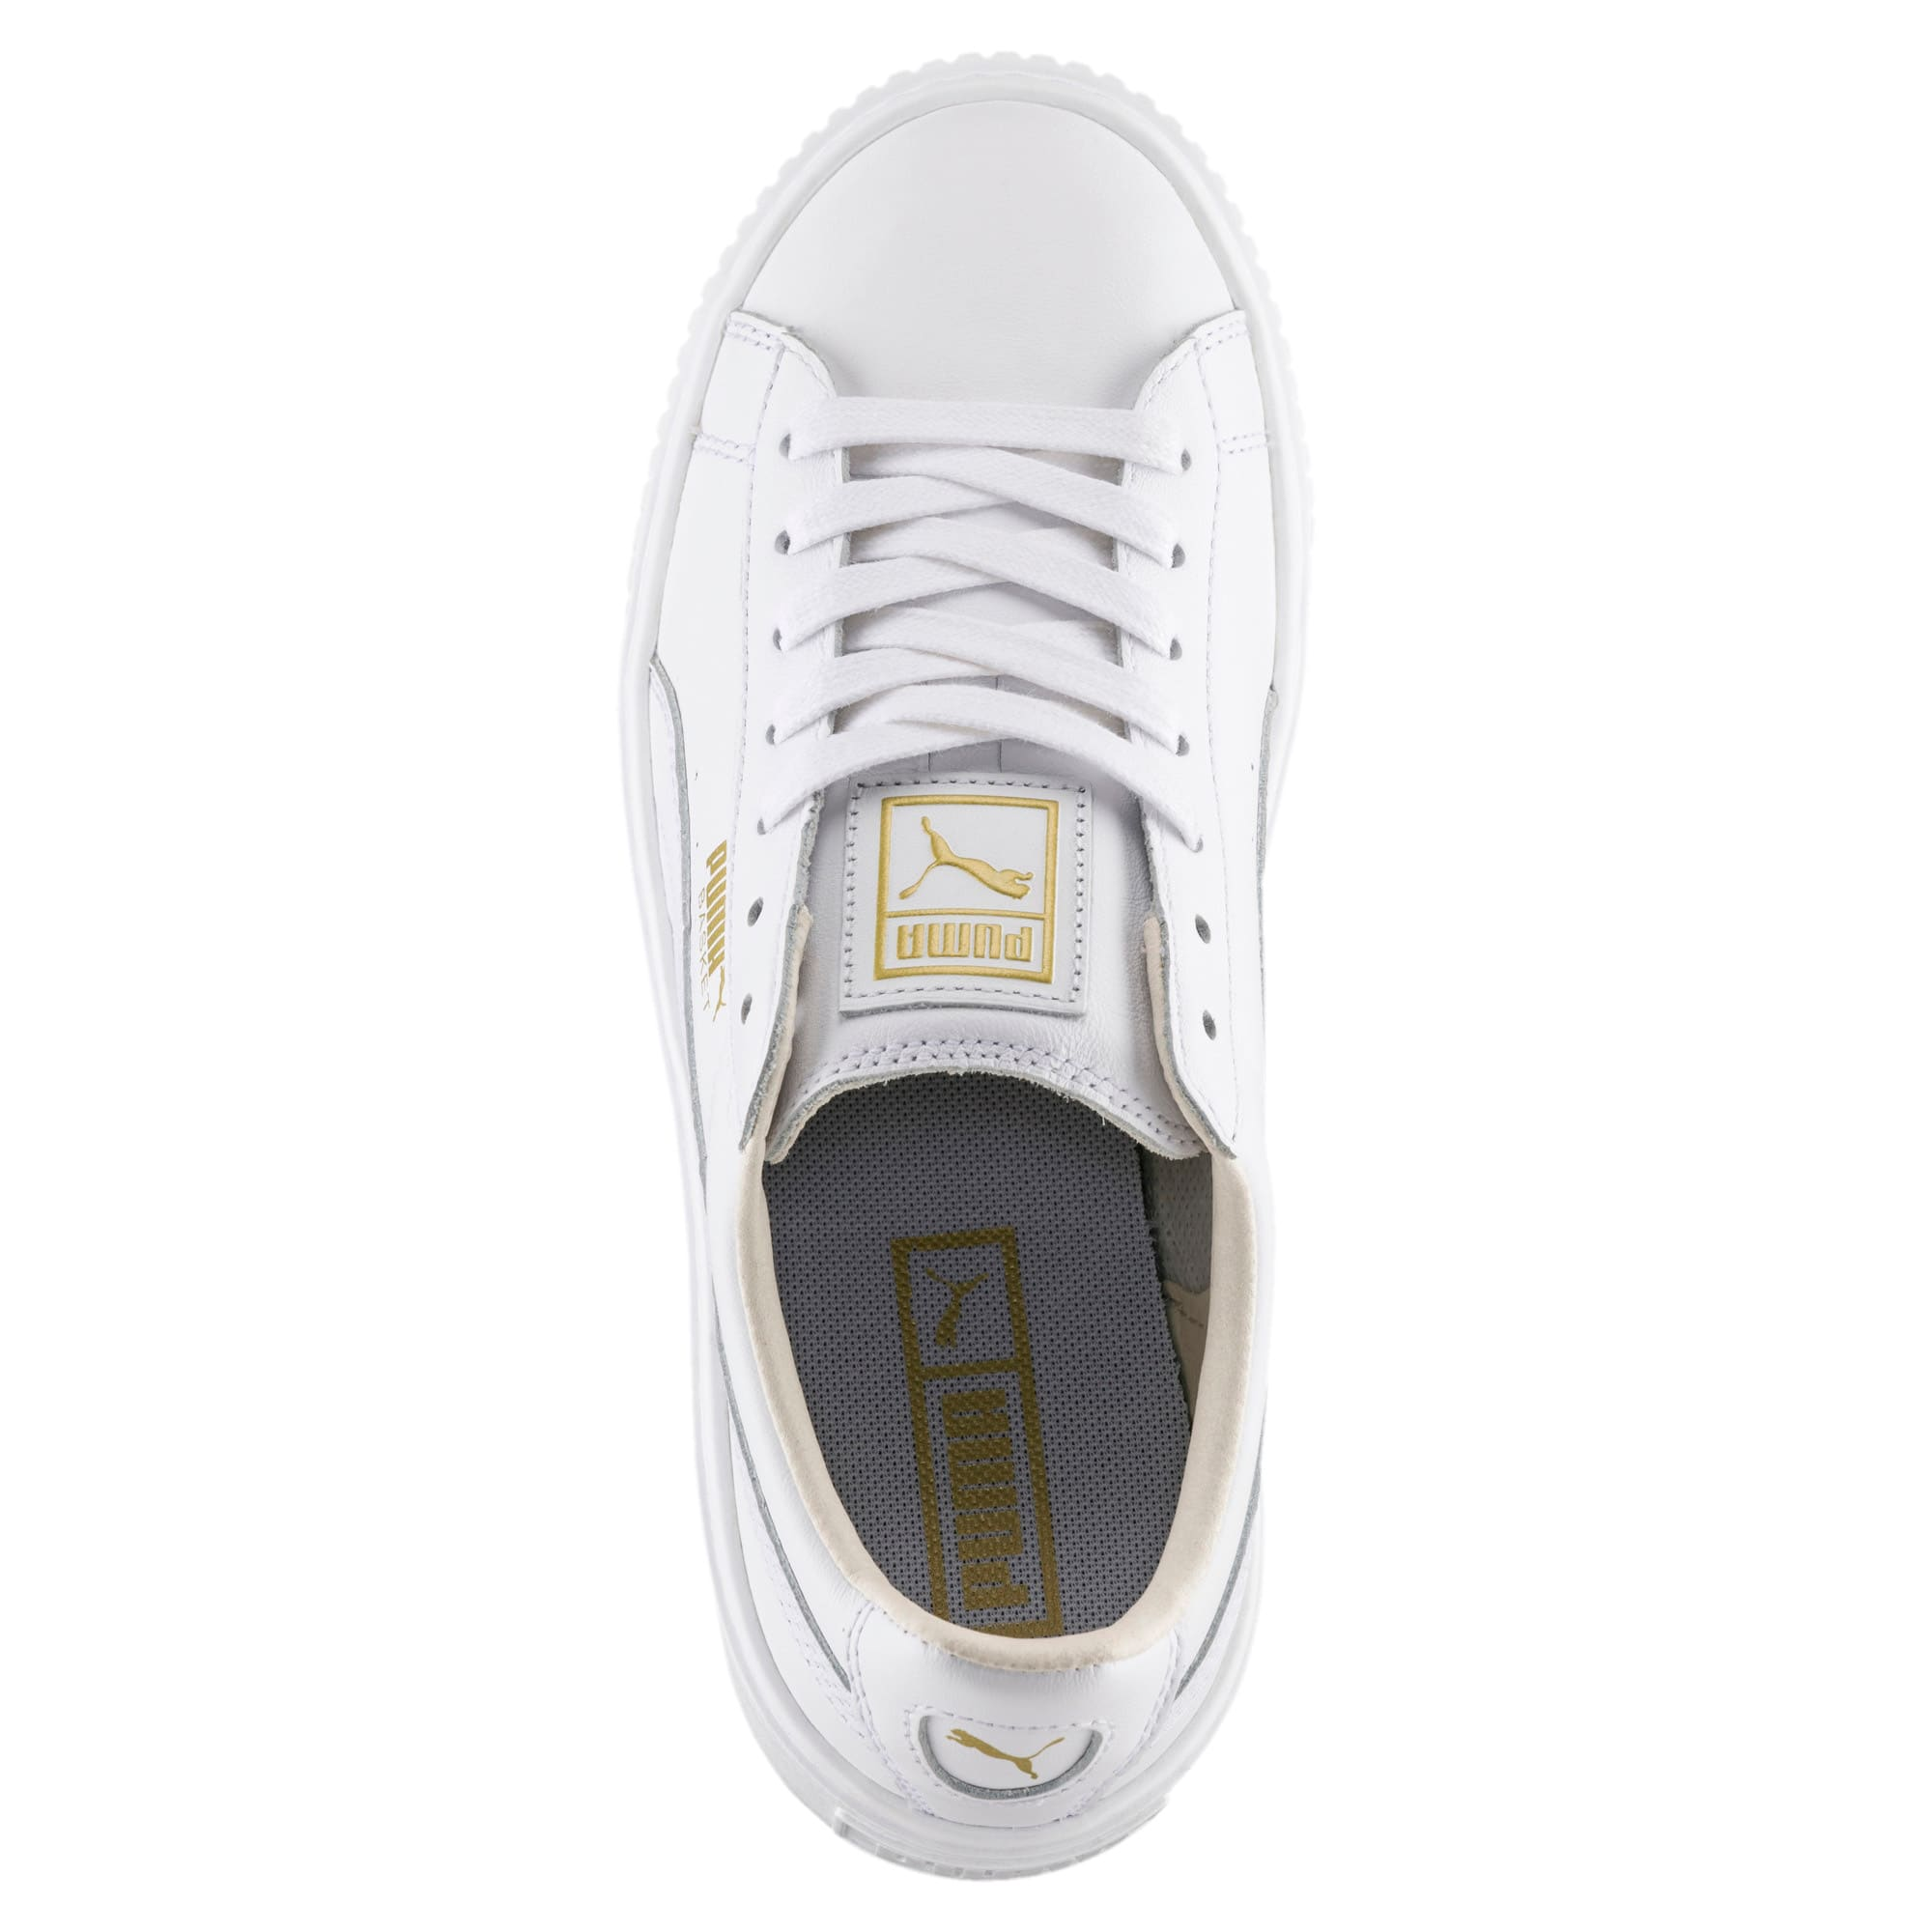 Thumbnail 5 of Basket Platform Core Women's Sneakers, Puma White-Gold, medium